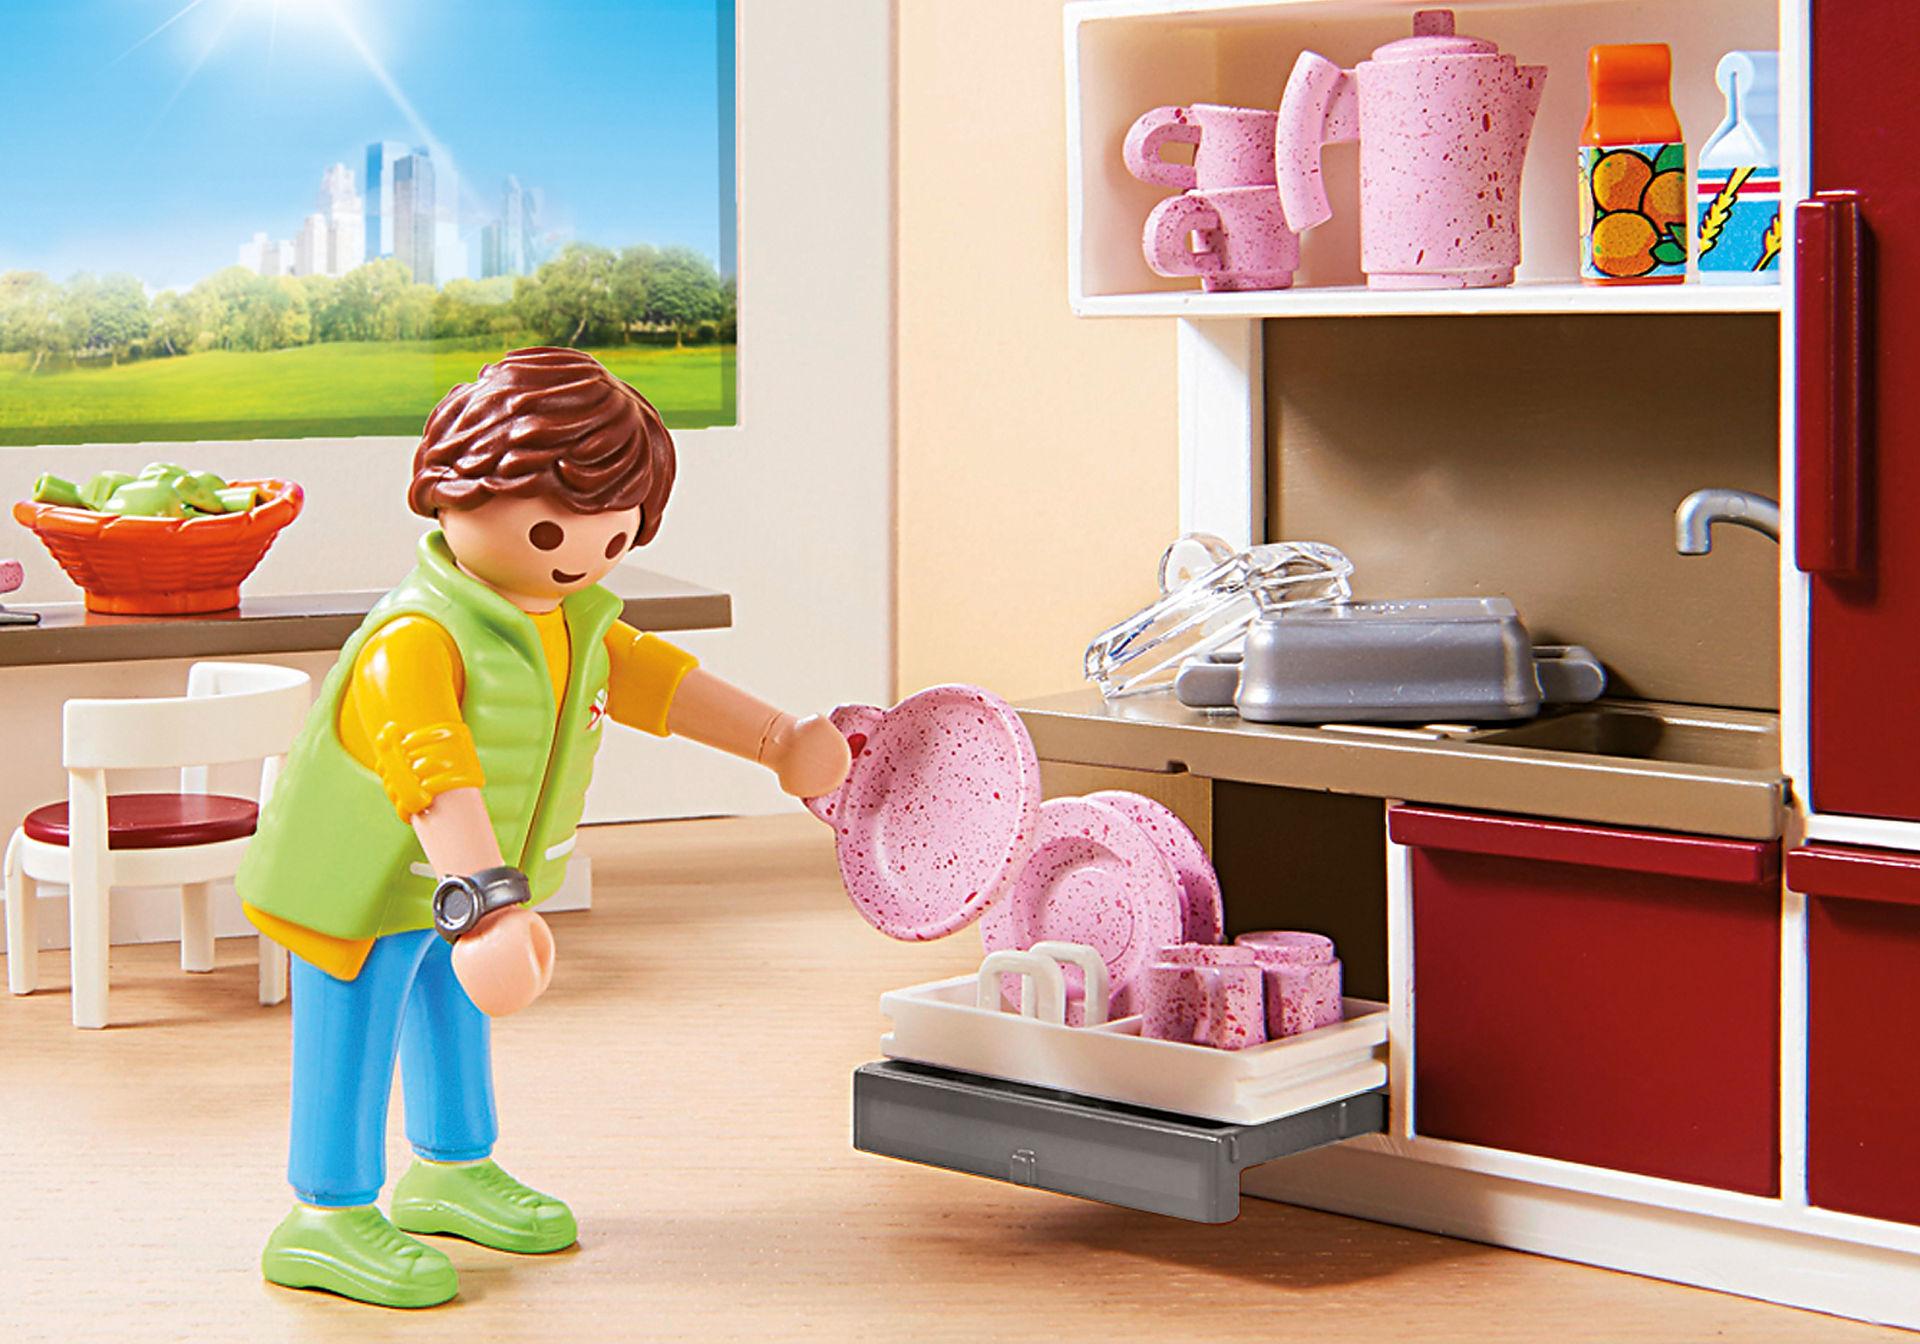 http://media.playmobil.com/i/playmobil/9269_product_extra2/Duża rodzinna kuchnia